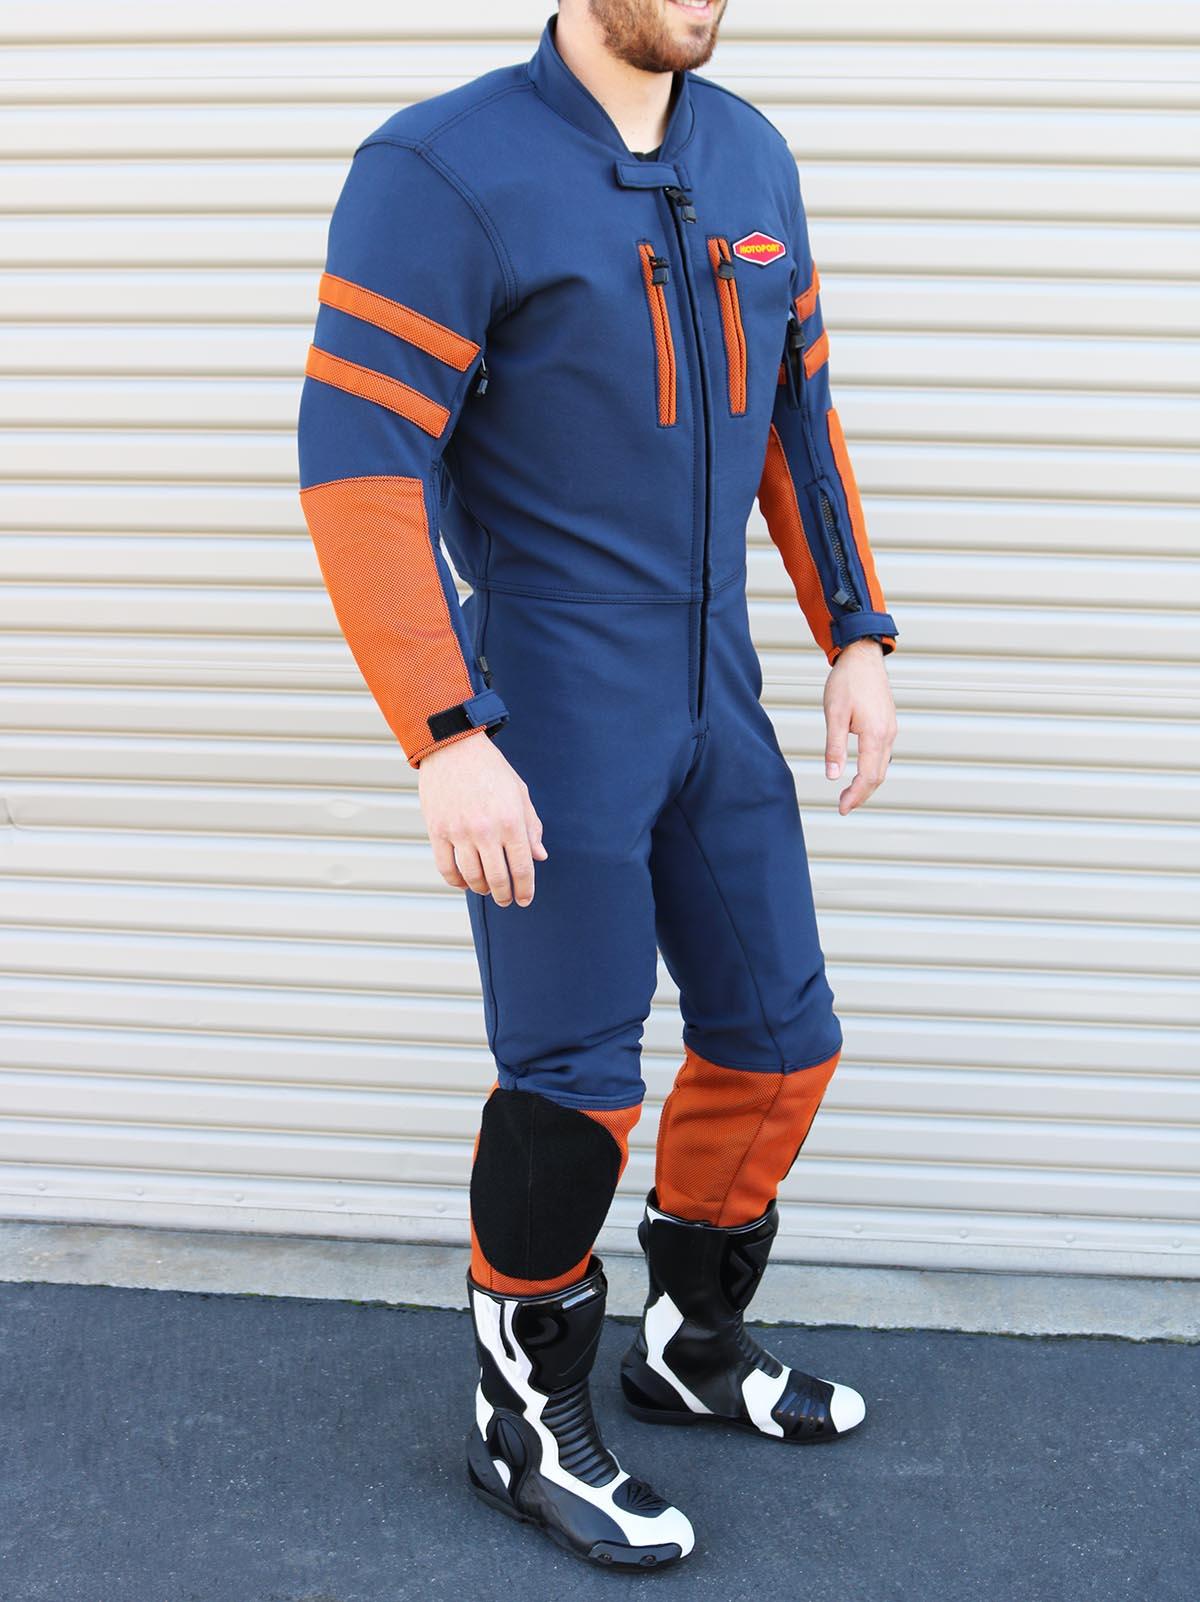 Gp 1 Stretch Suit Motoport Usa